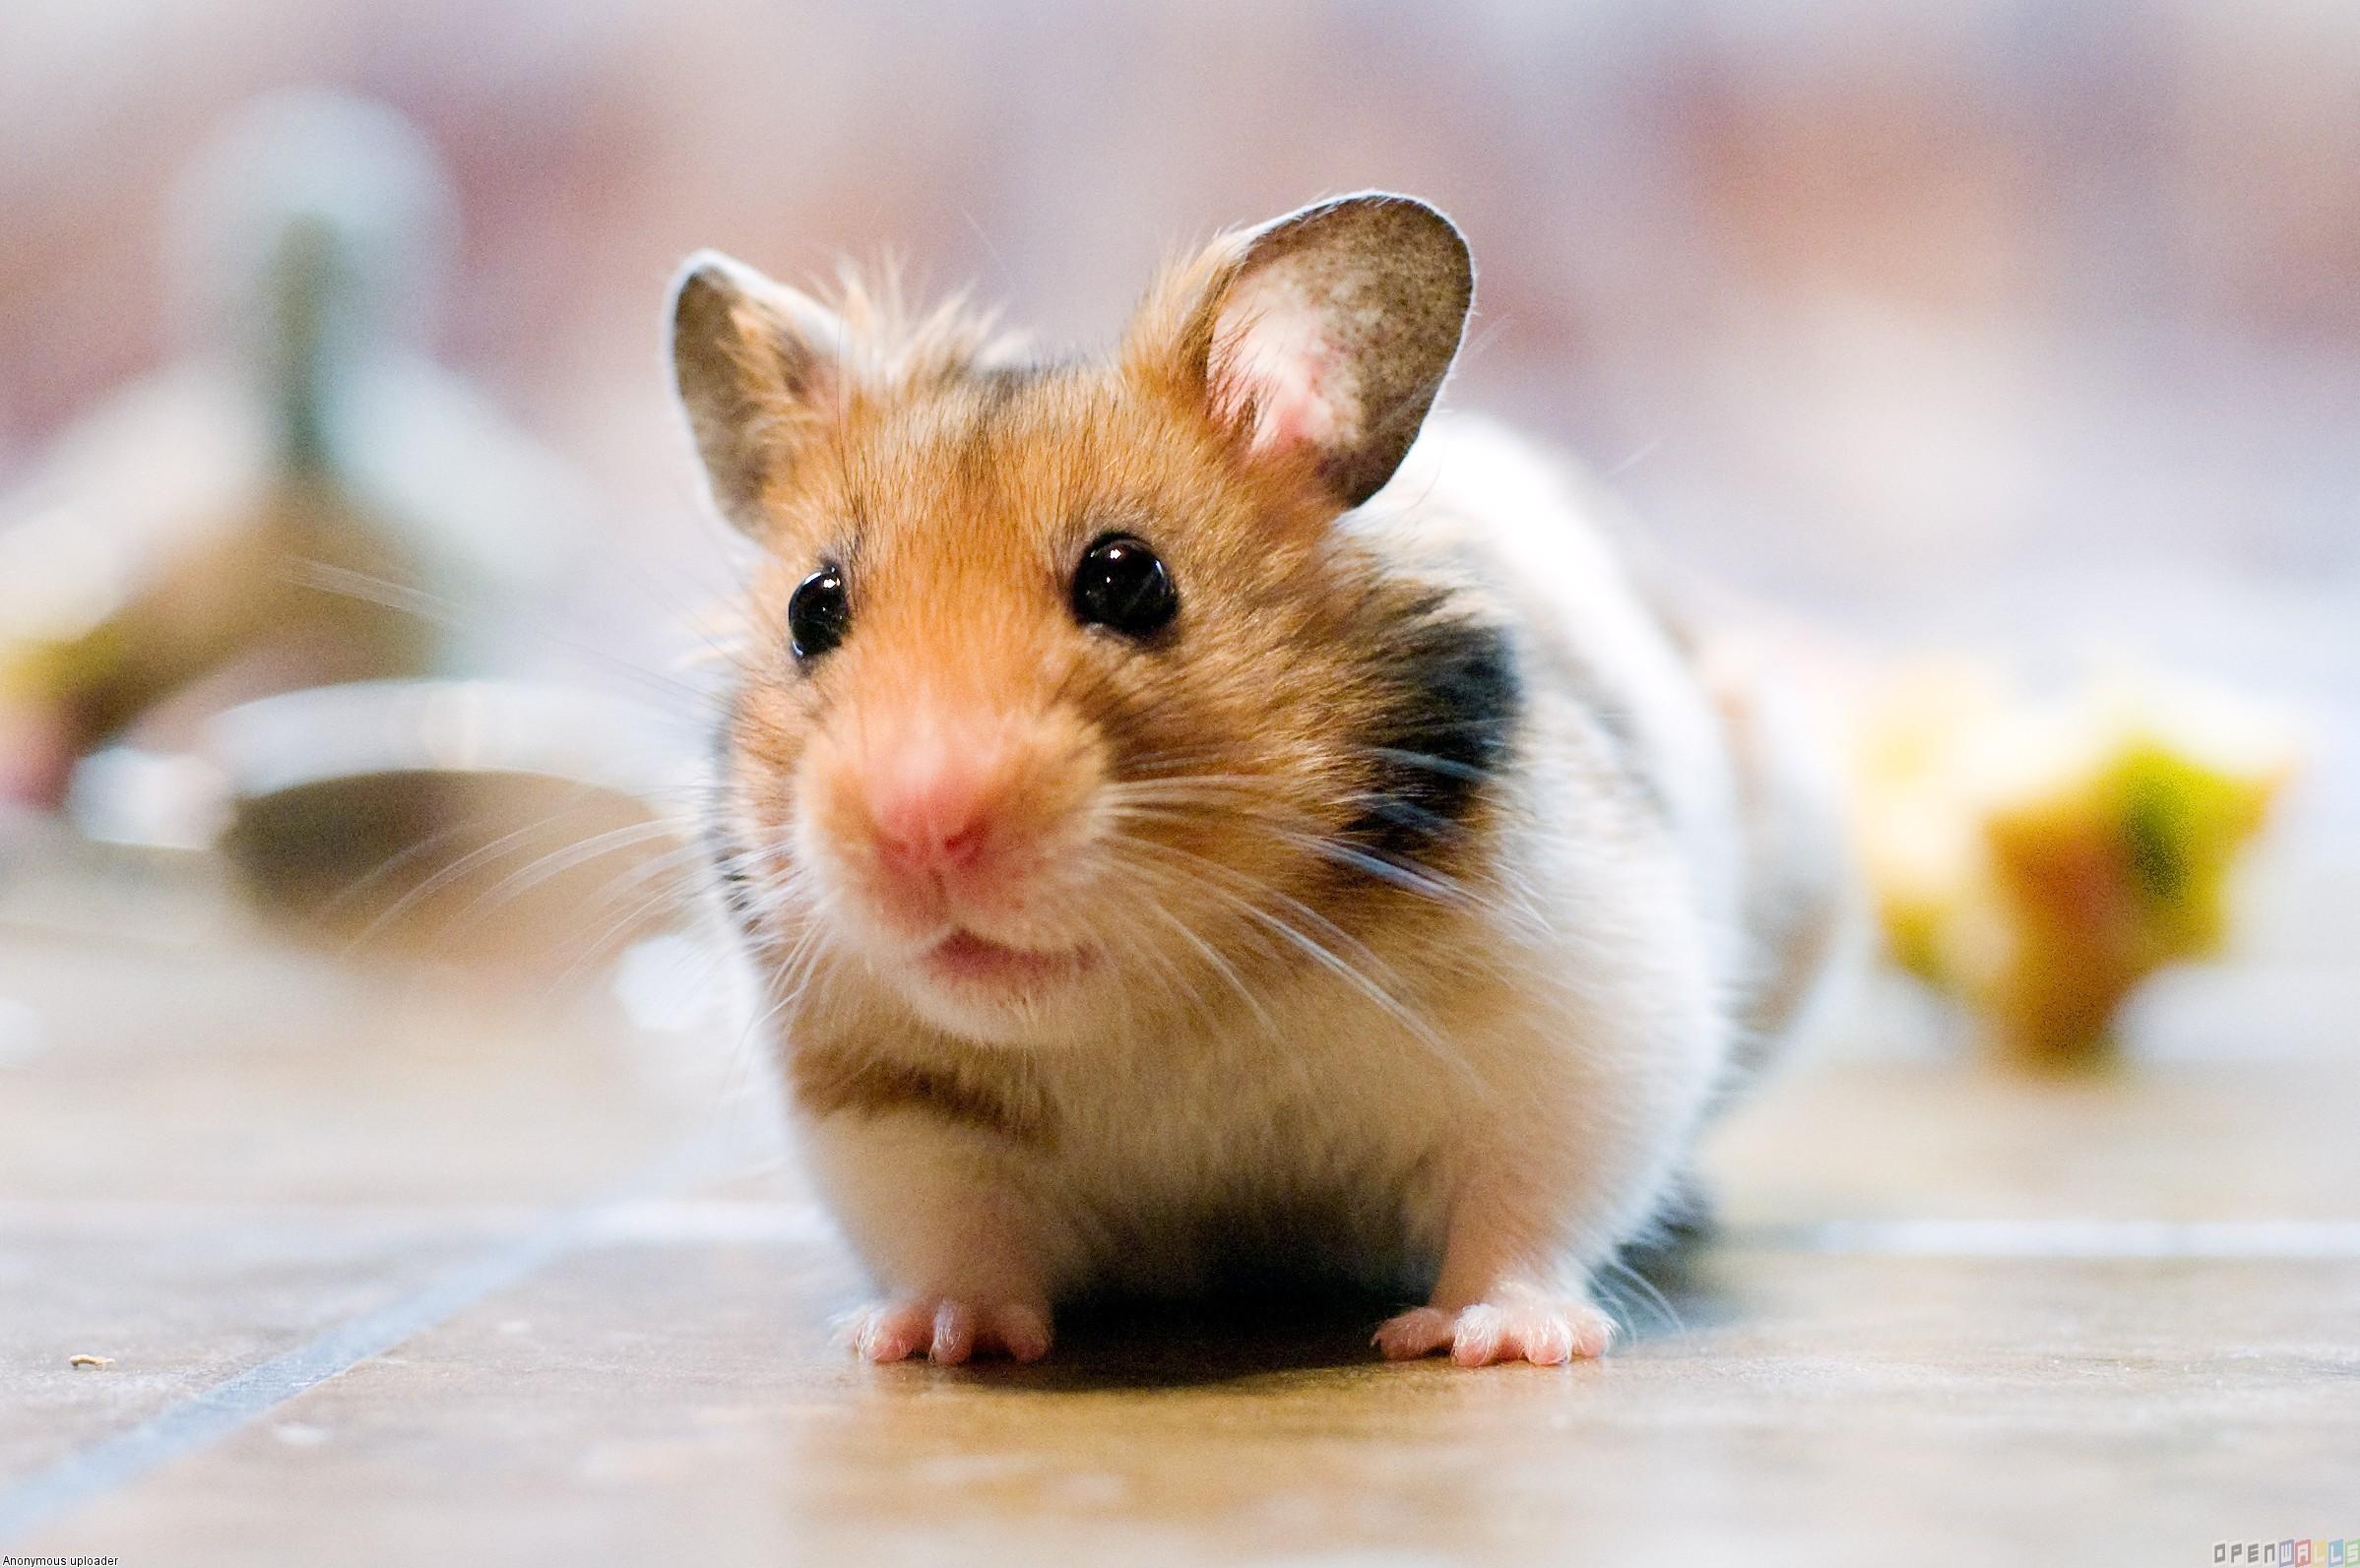 Cute hamster wallpaper 11747   Open Walls 2397x1593